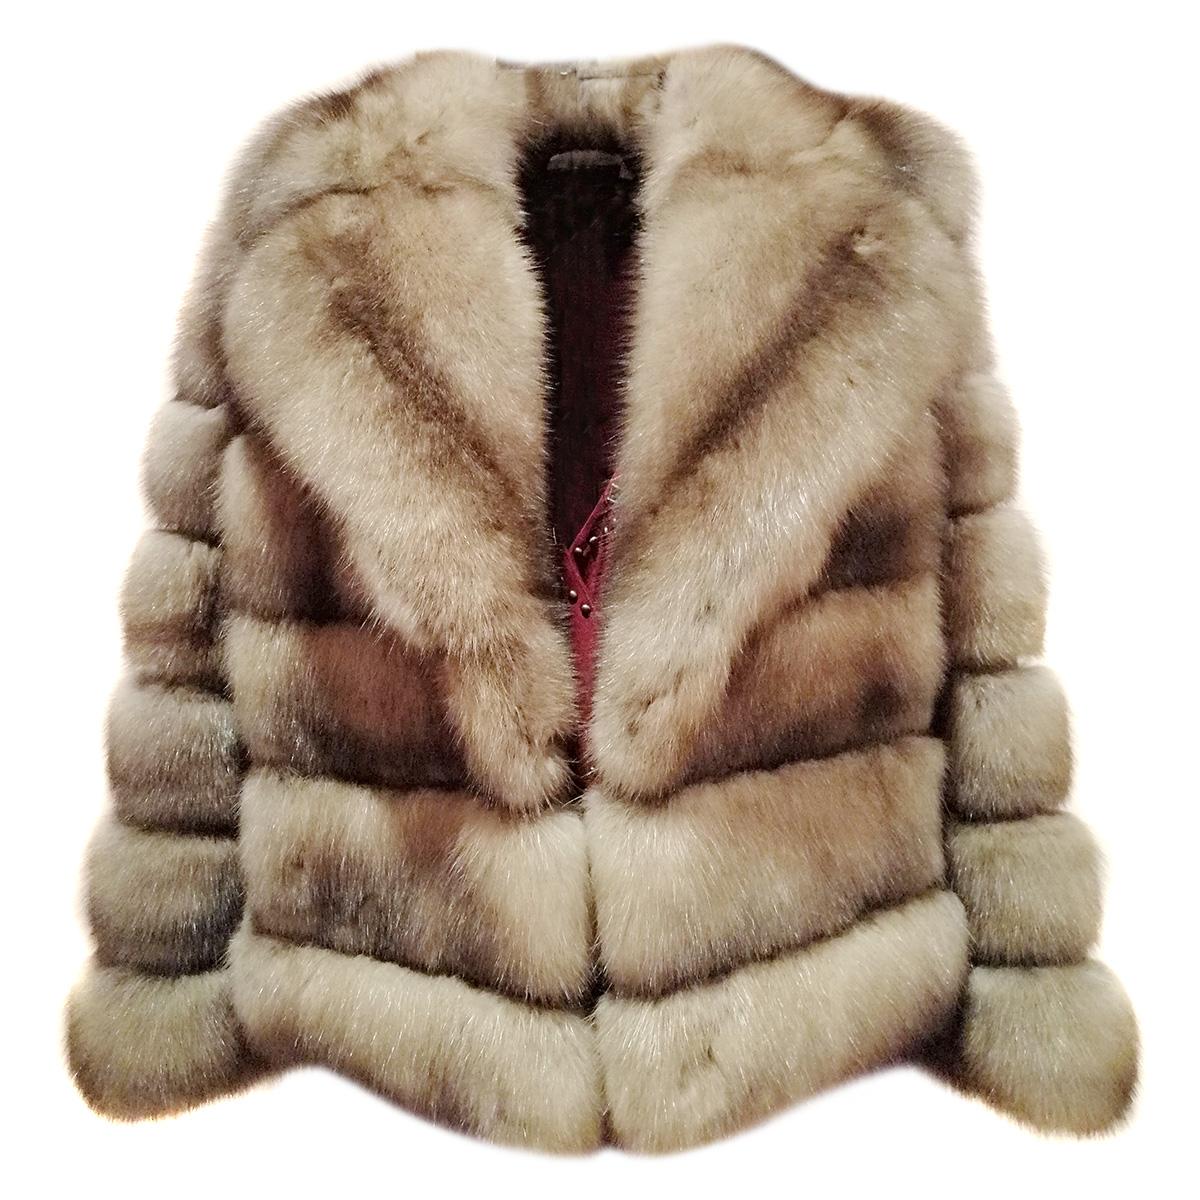 Barguzinsky Silvery Russian Sable Fur Jacket